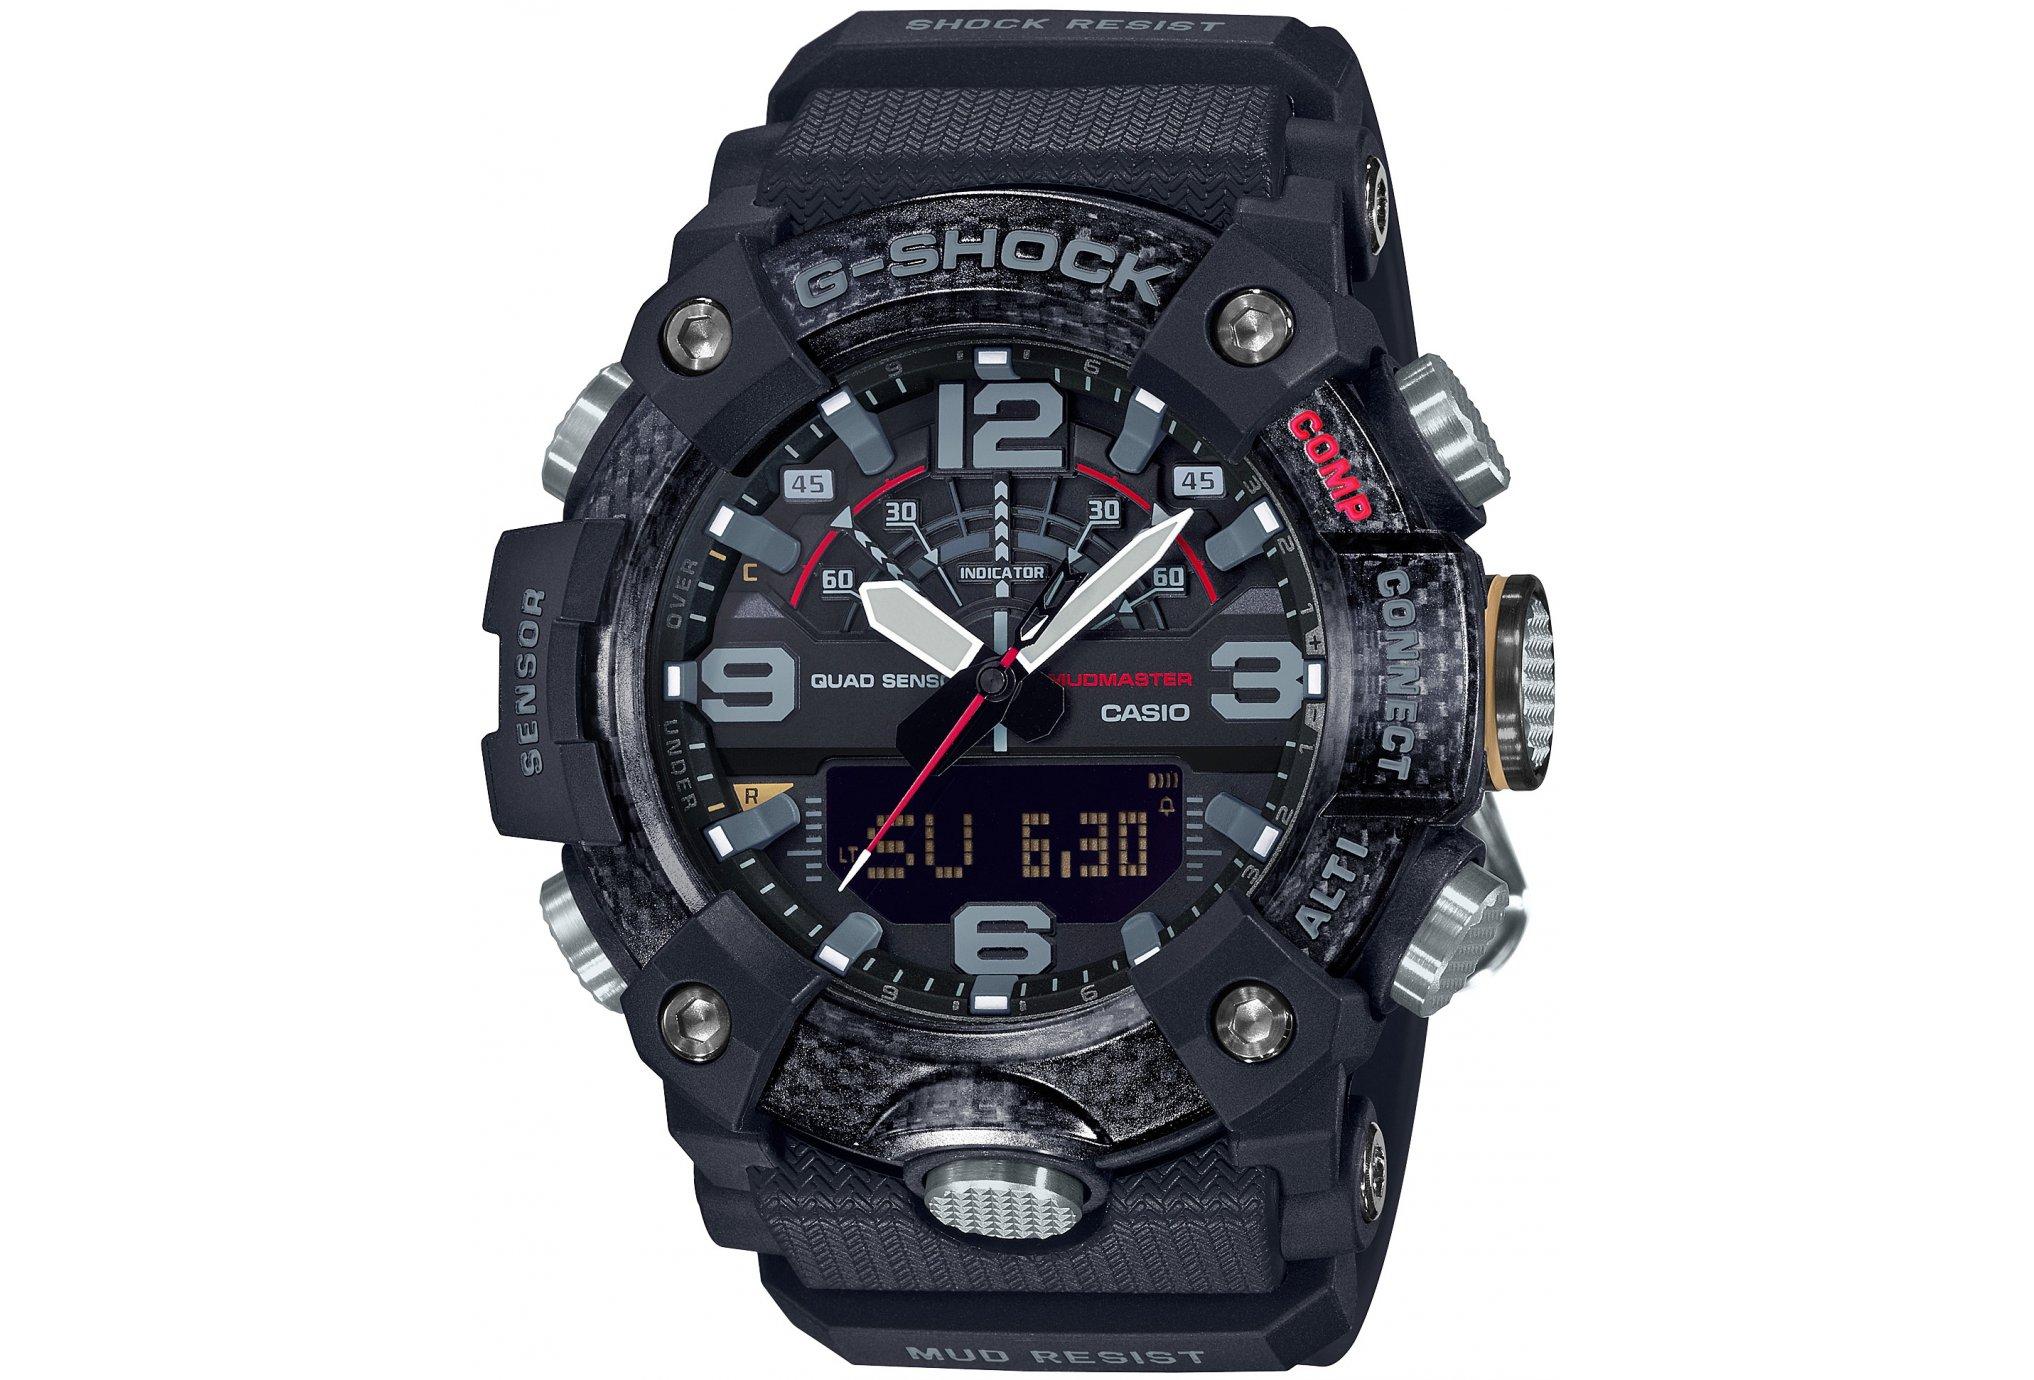 Casio G-Shock gg-b100-1aer montres de sport